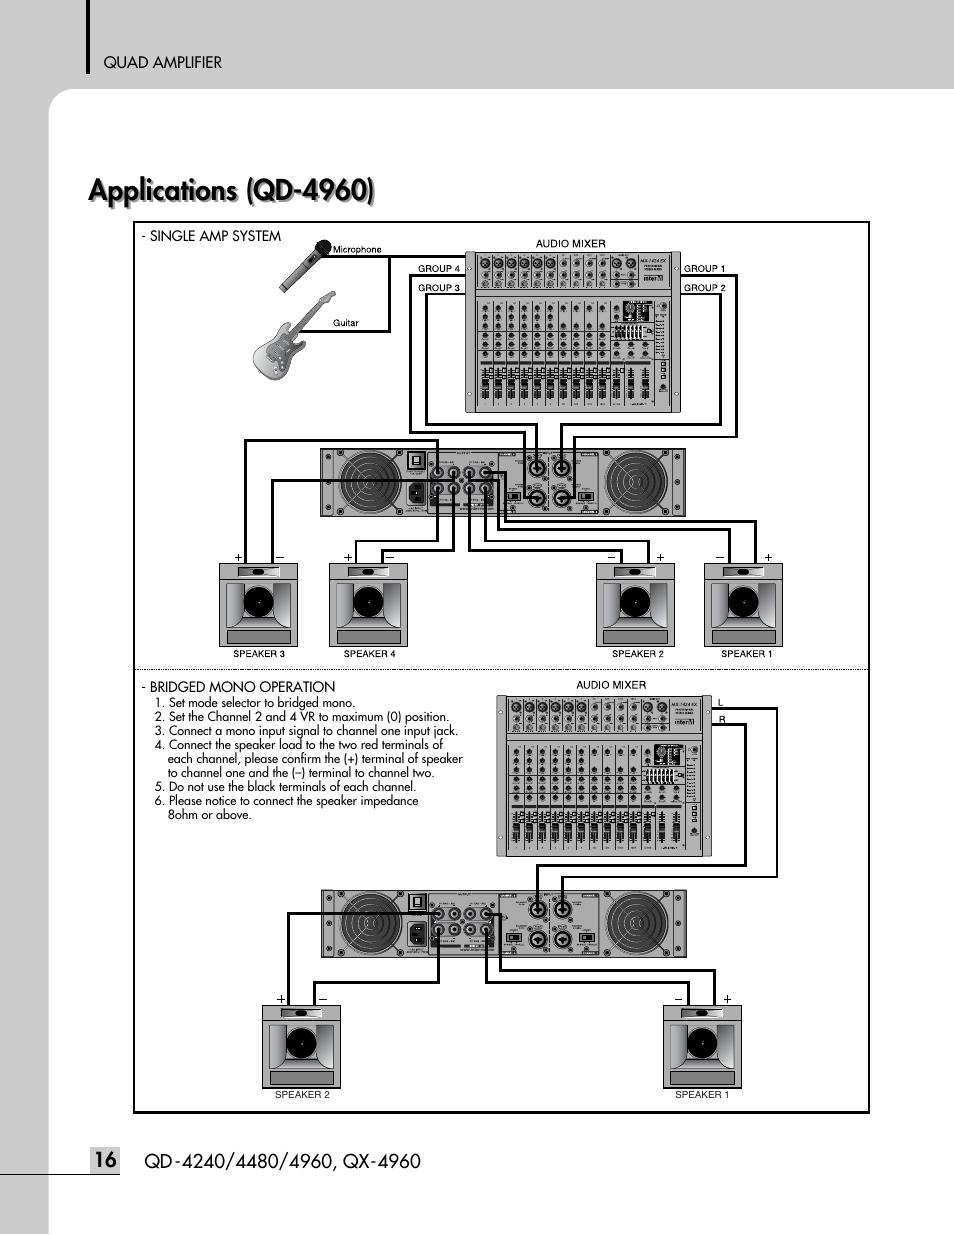 INTER M QD 4960 PDF